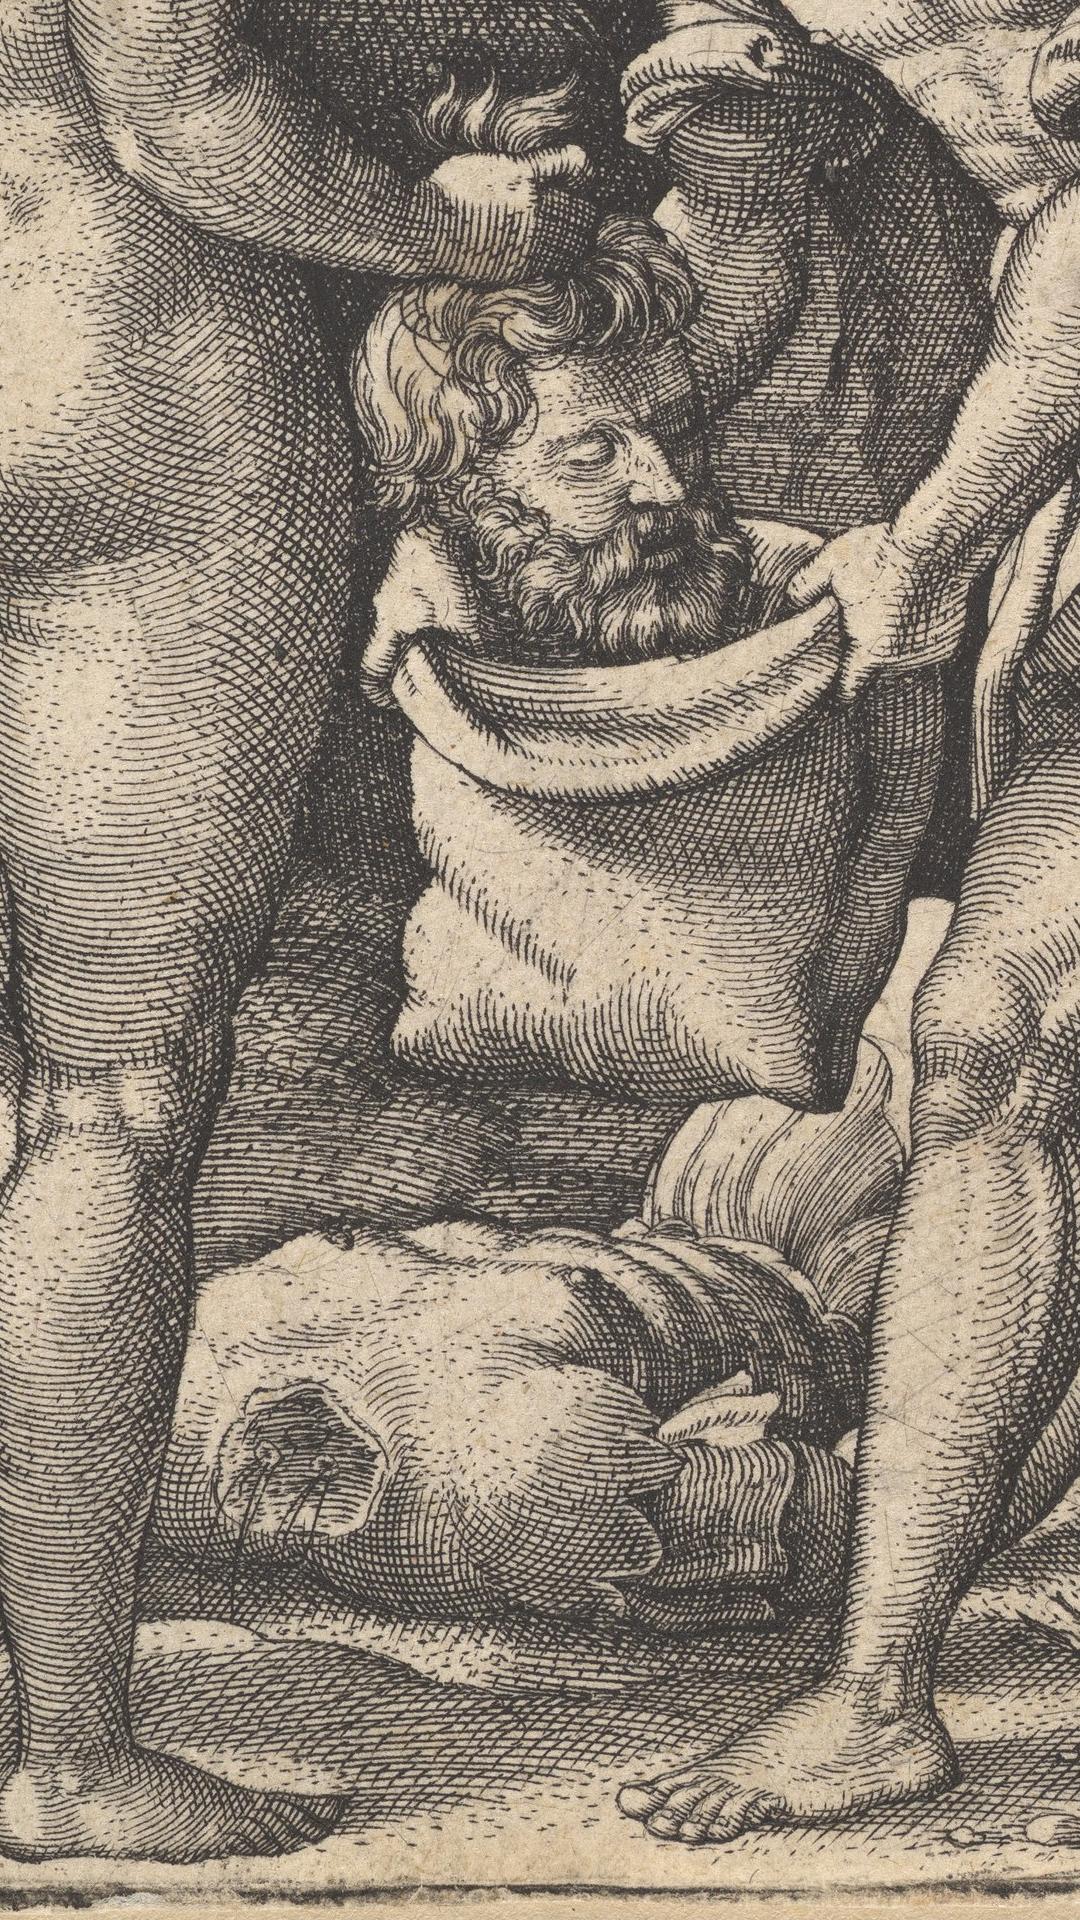 Tomyris Hiding King Cyrus's Head.jpg